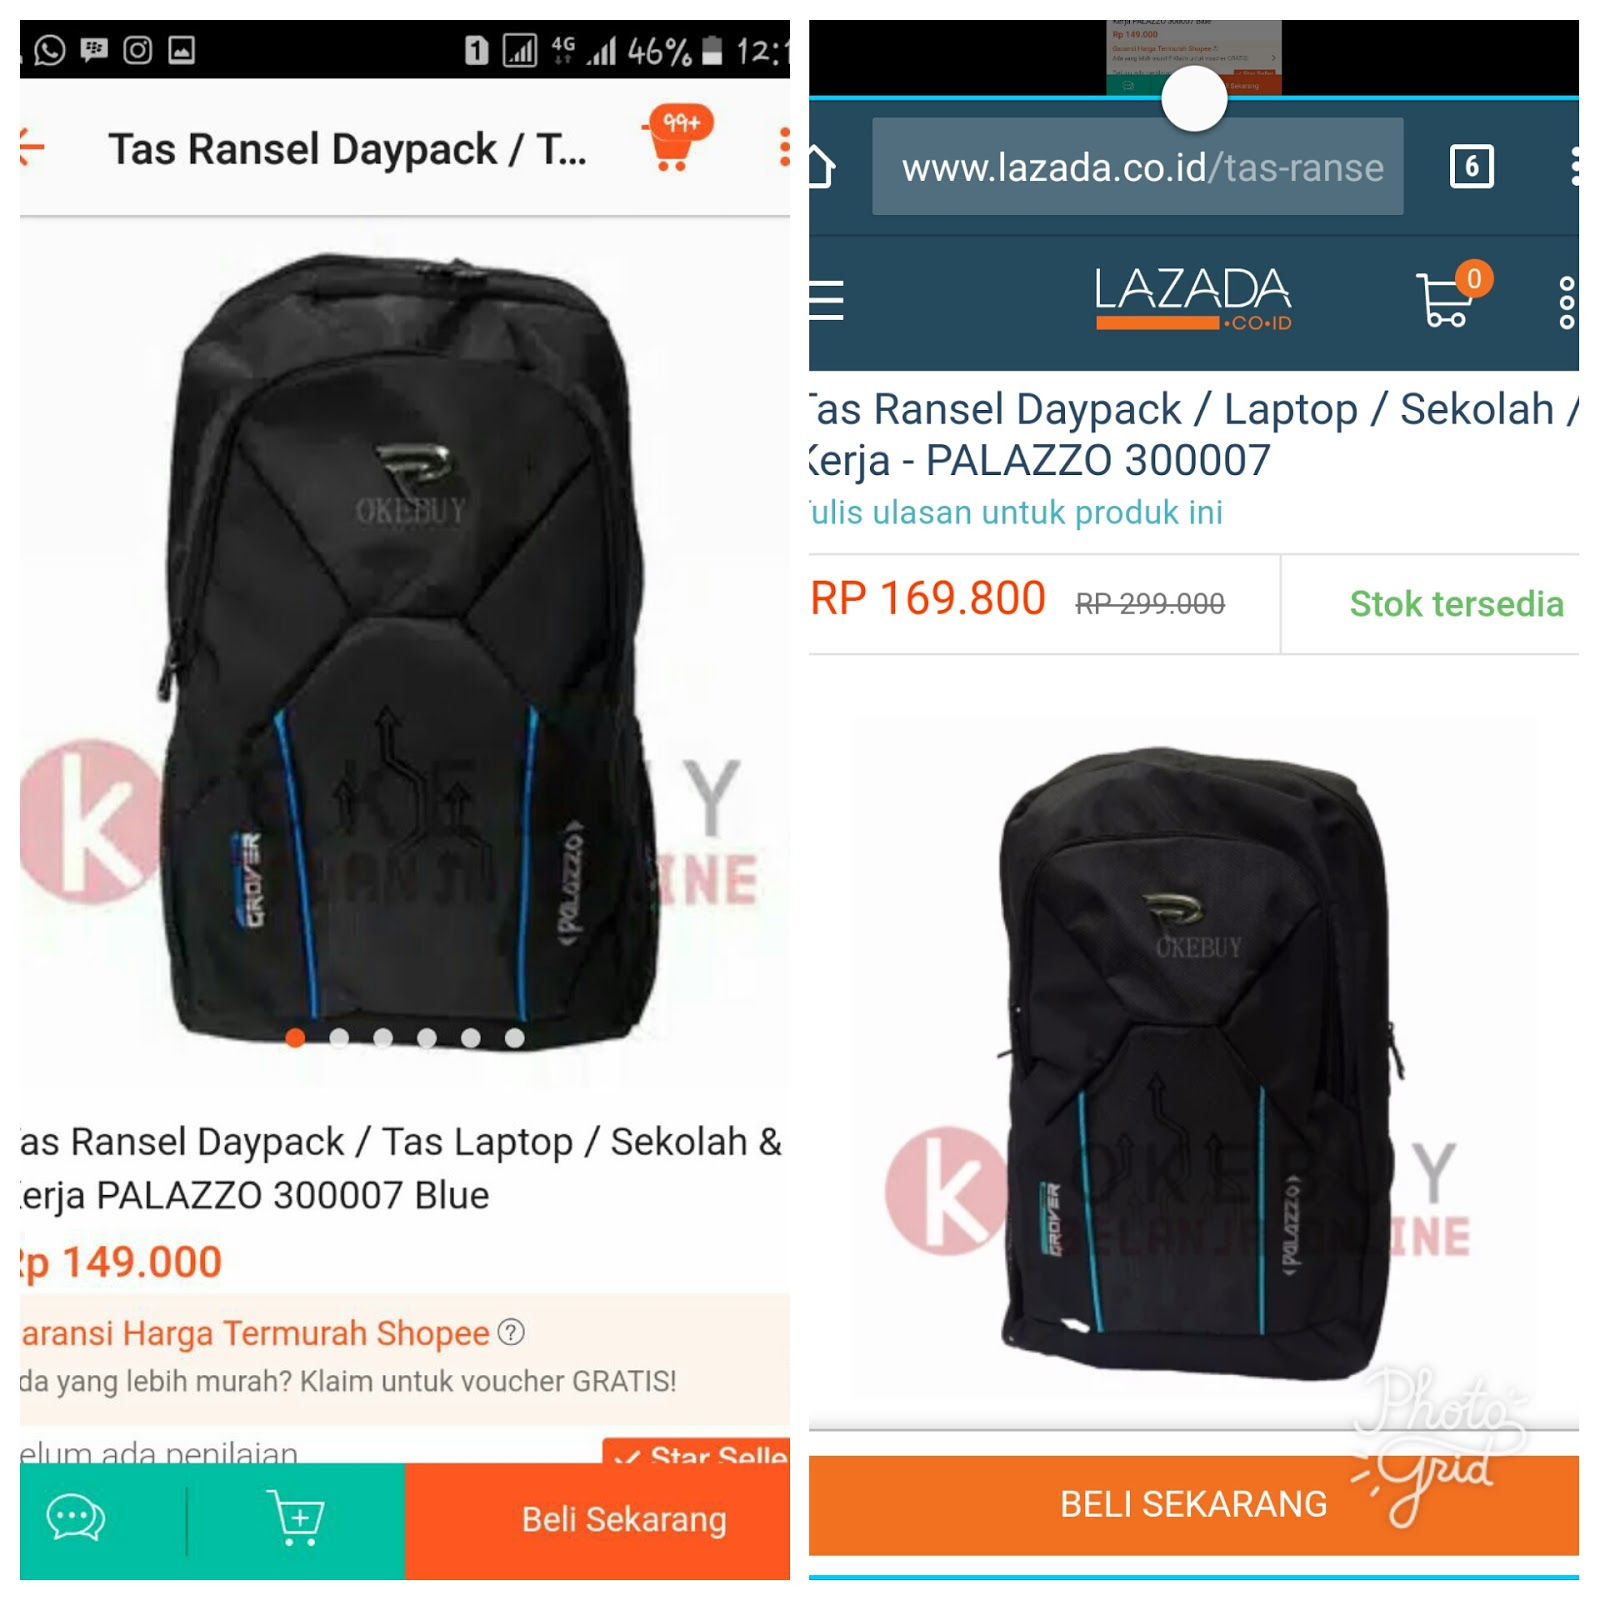 Tas Ransel Daypack Dapat Digunakan Untuk Sekoalah Dan Kerja Terdapat Tempat Leptop Bahan Berkualitas Terdiri Dari